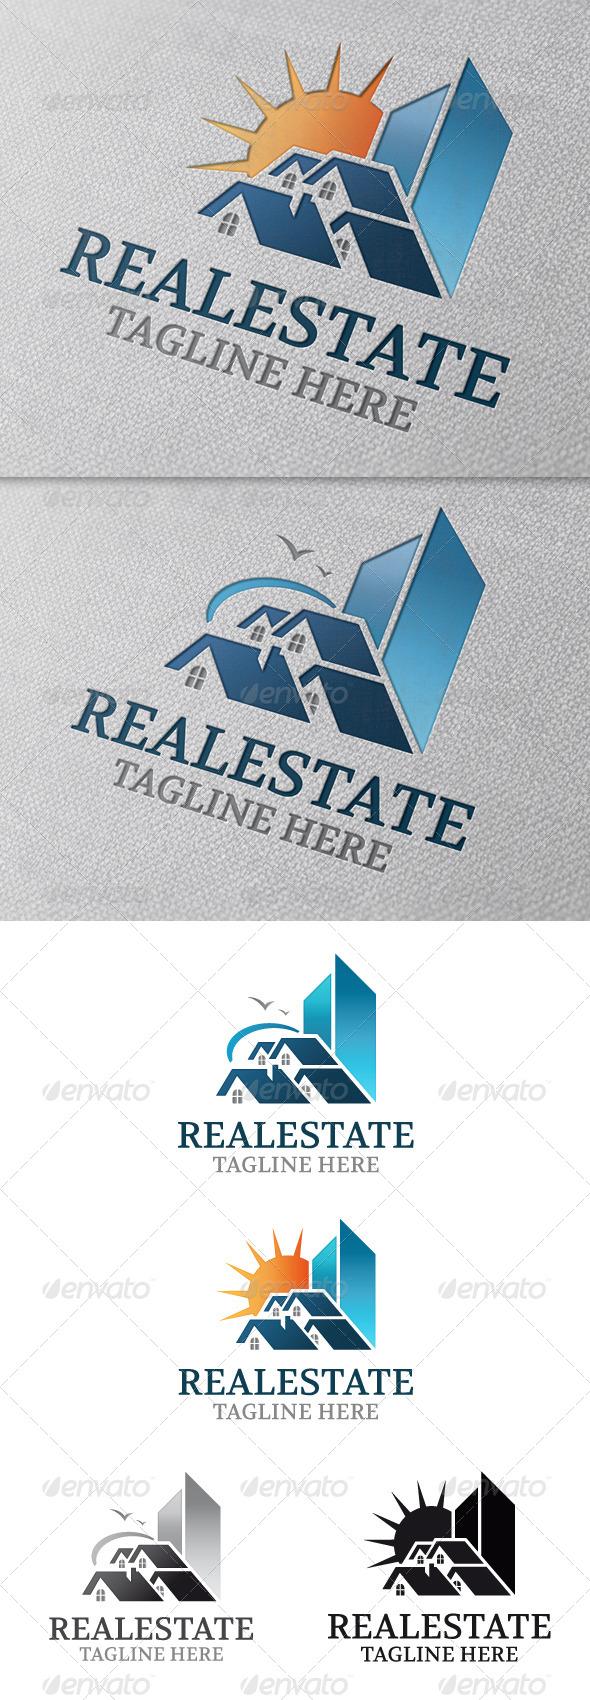 GraphicRiver Real Estate Modern Logo Template 4792886